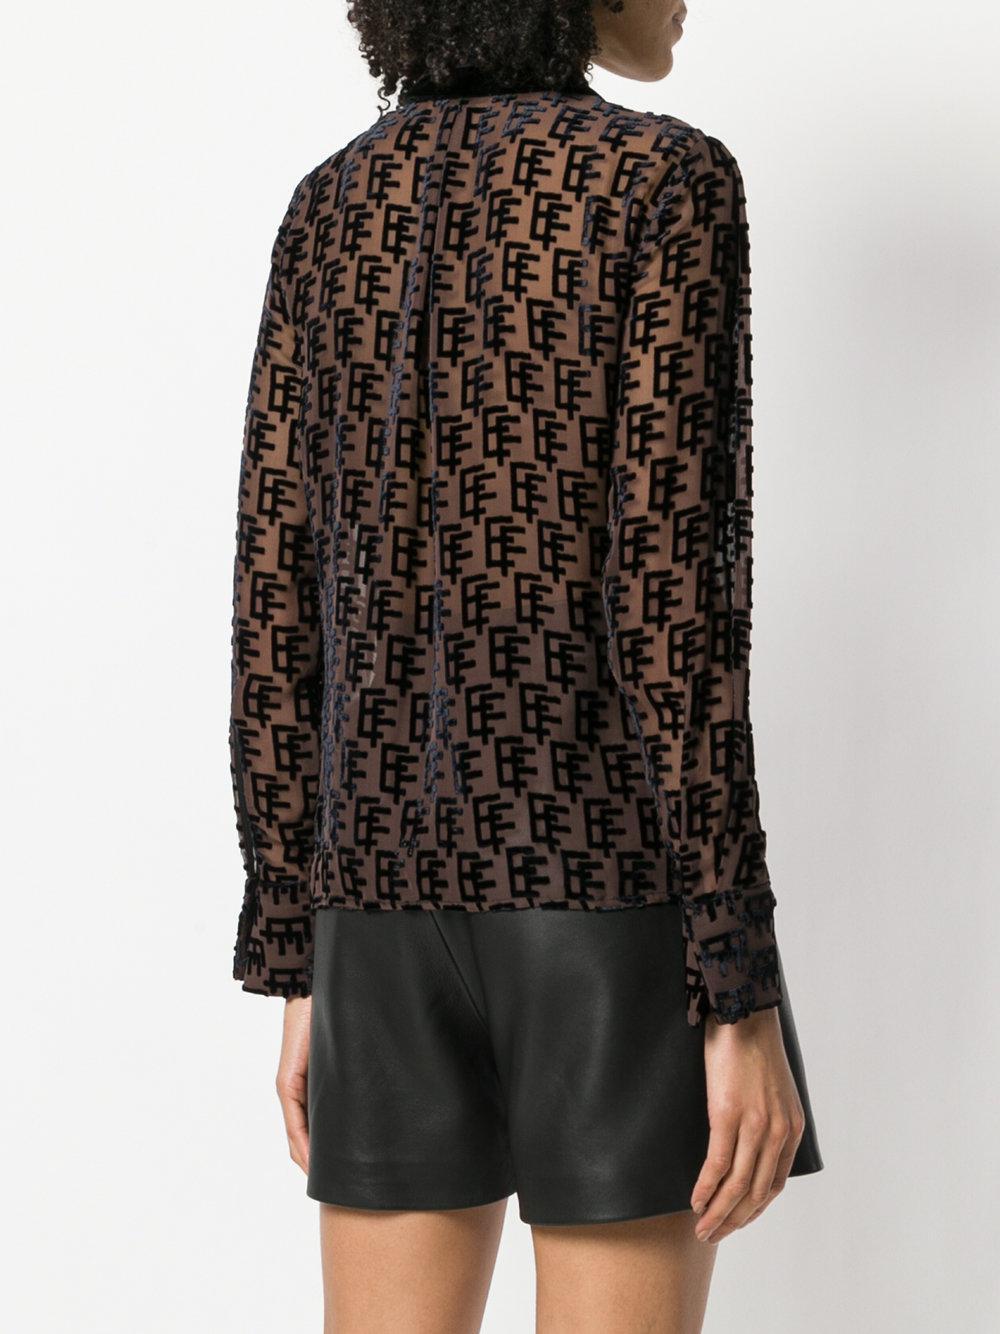 monogram print shirt - Black Elisabetta Franchi Outlet High Quality Quality JVrQuOBH